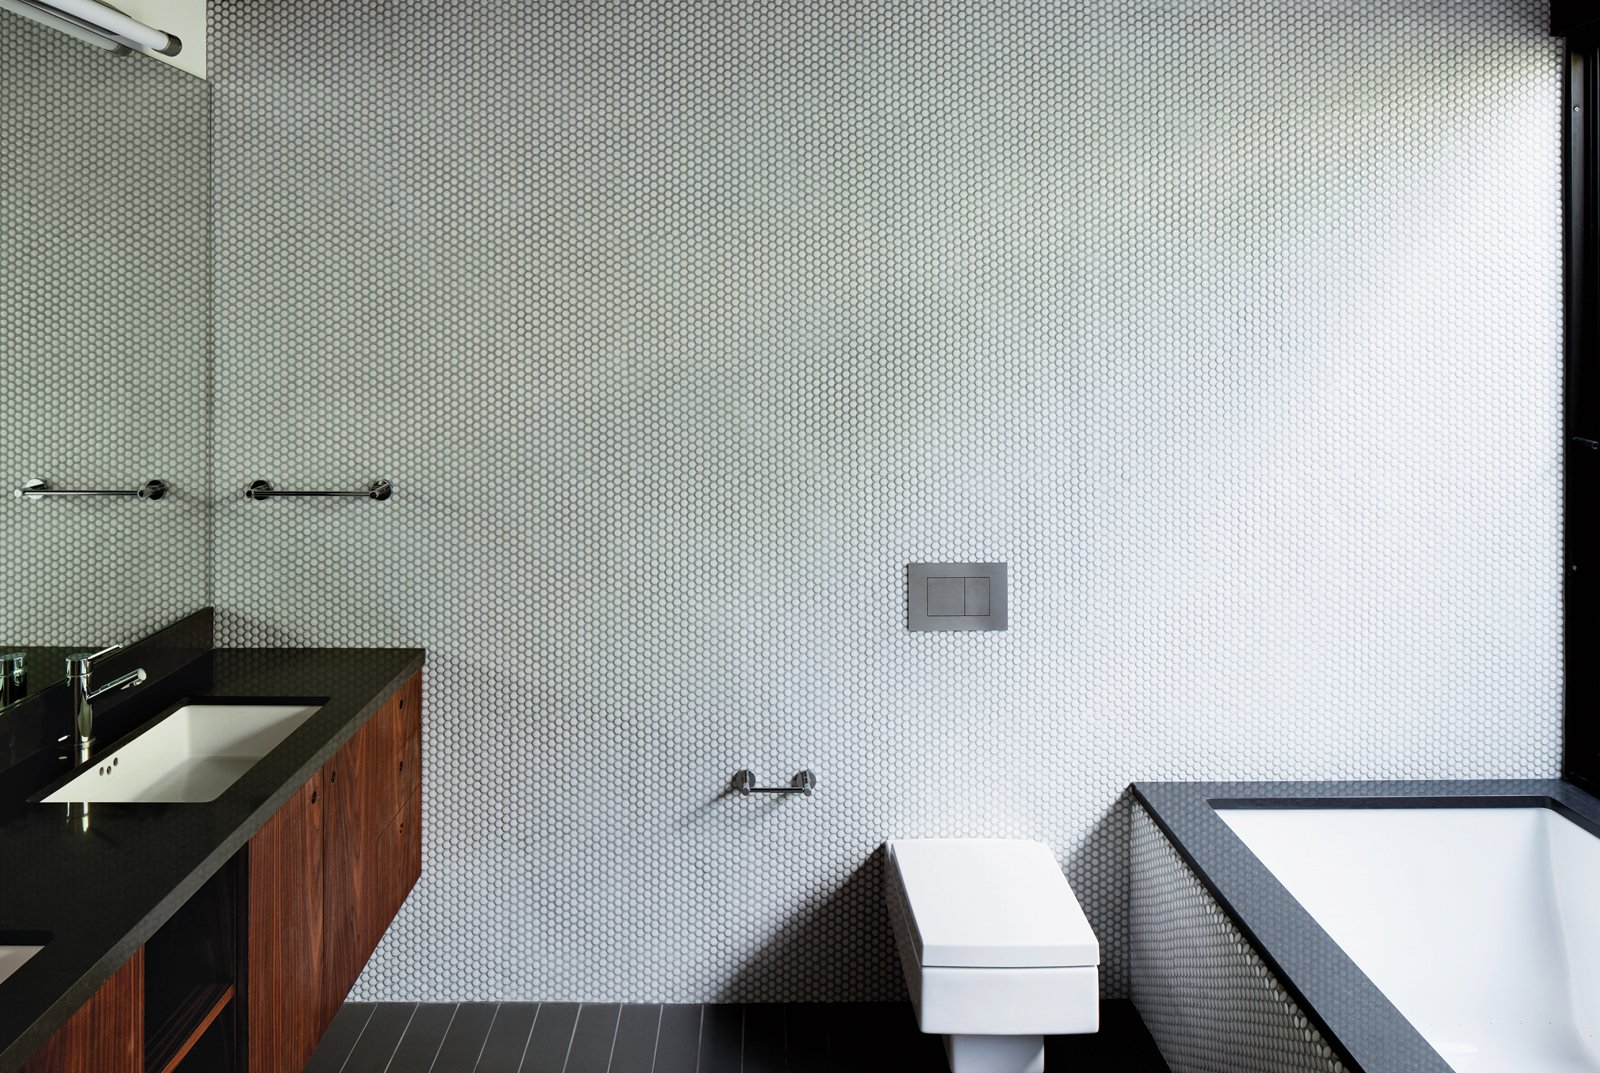 Bath Room, Undermount Sink, One Piece Toilet, and Undermount Tub  Photos from A Minimalist Bathroom in Los Angeles